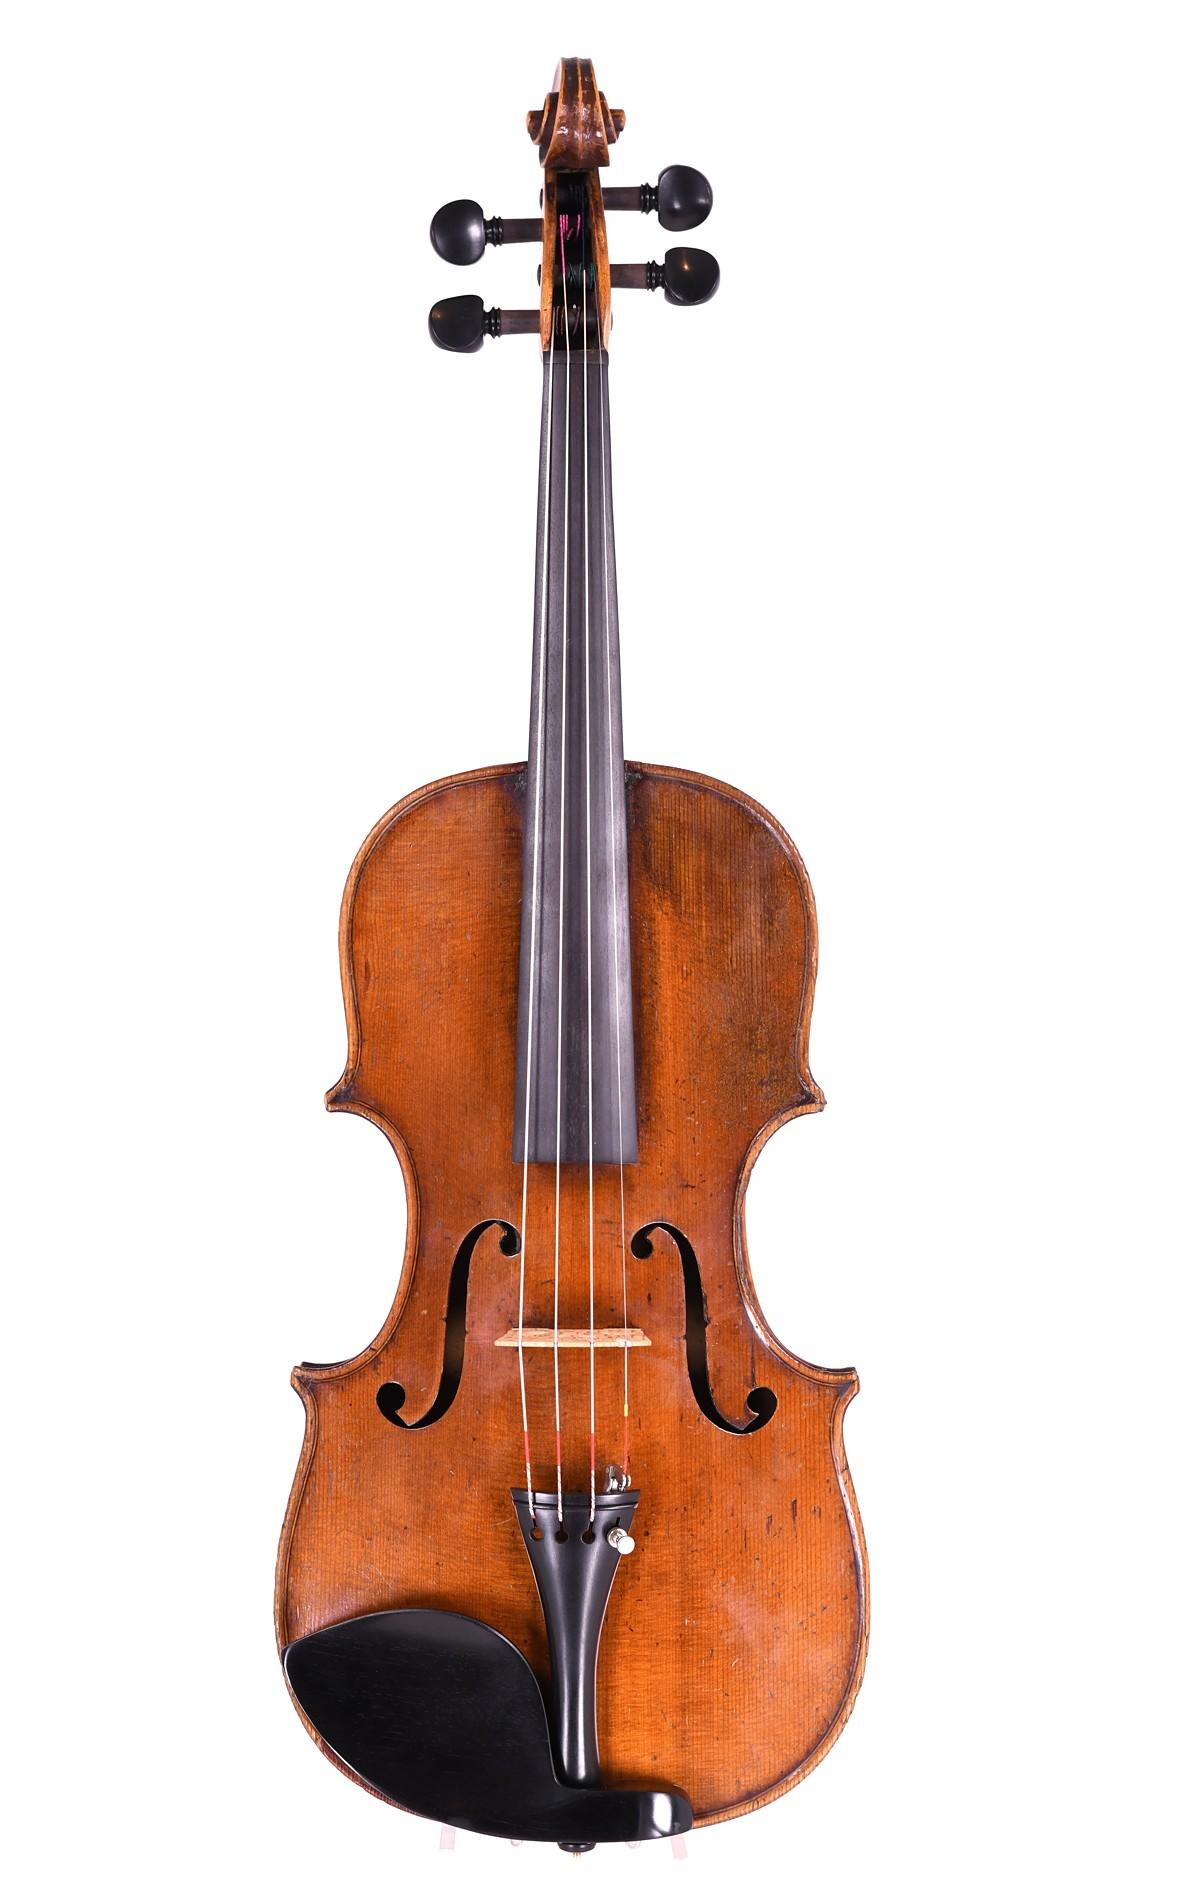 Hopf violin, Klingenthal - table of spruce wood